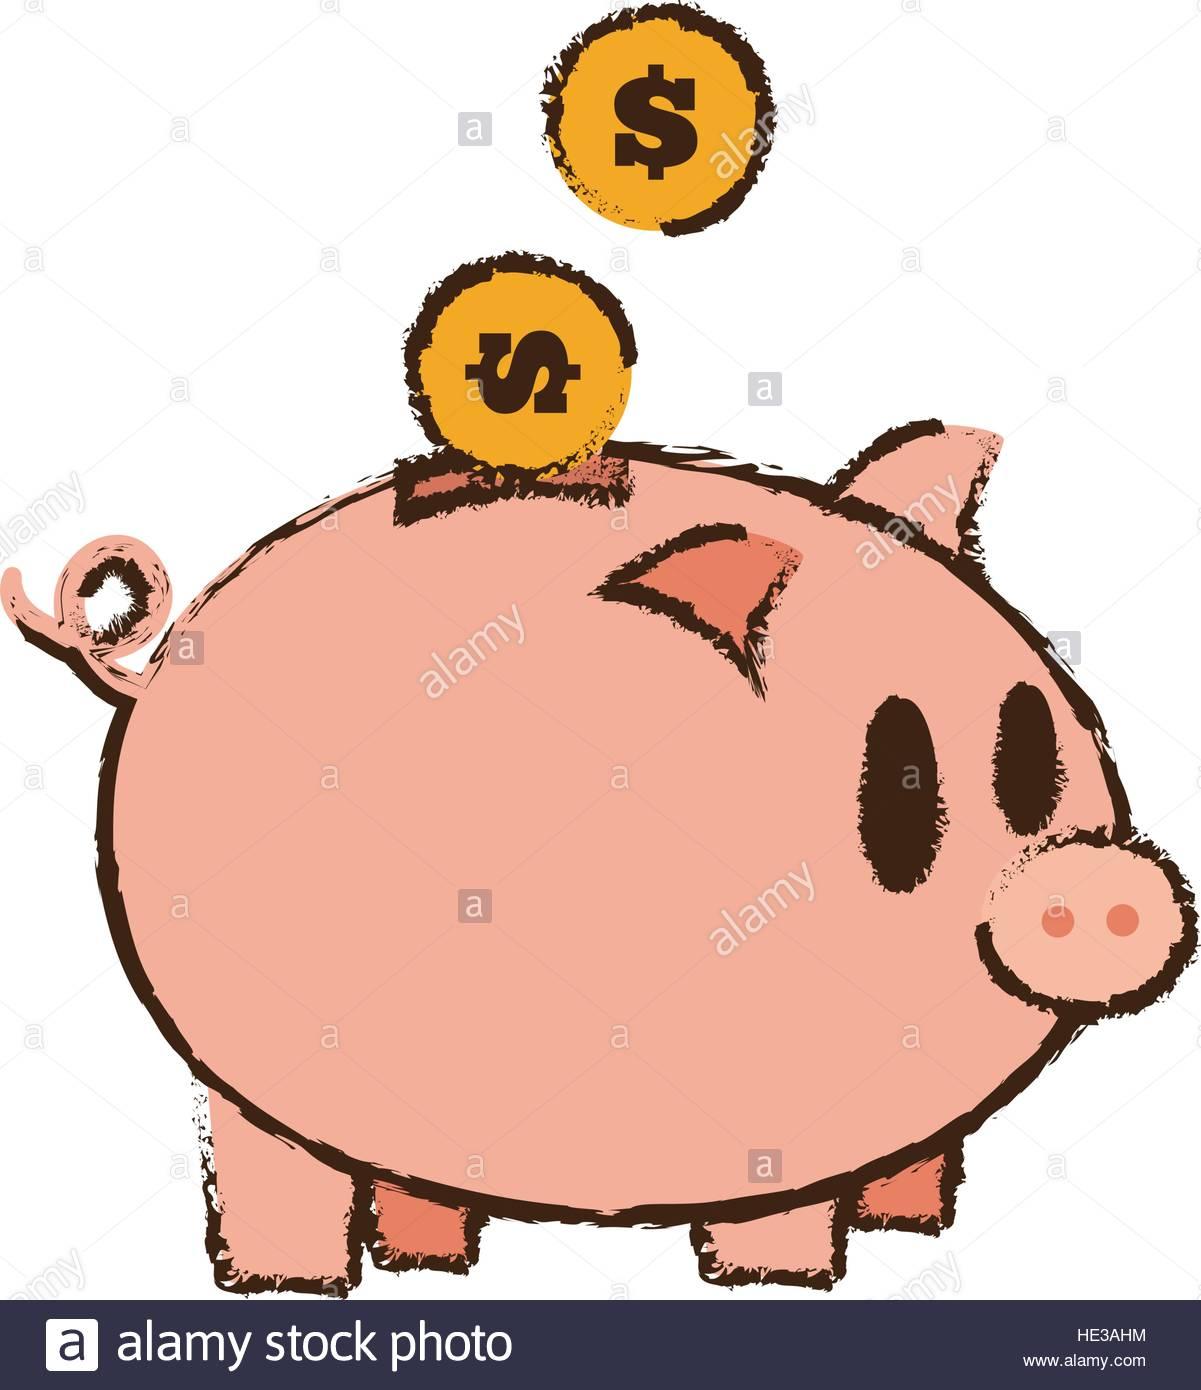 1201x1390 Drawing Save Money Piggy Coins Bank Stock Vector Art